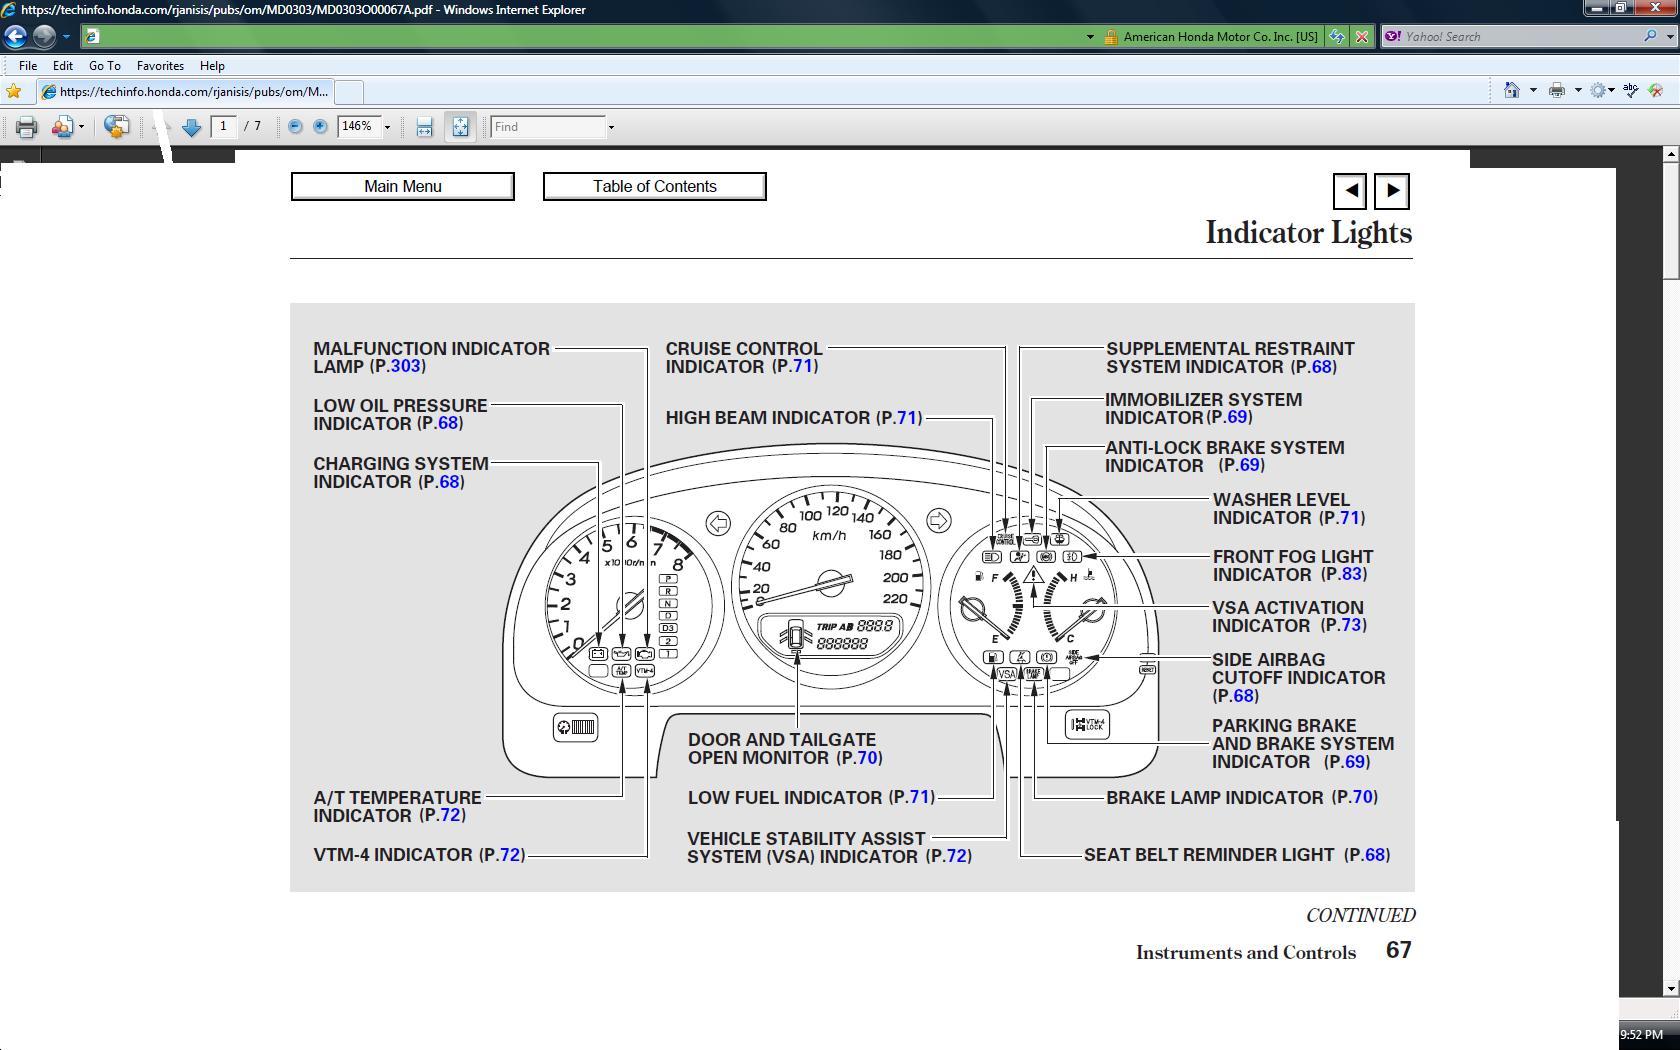 hight resolution of 03 acura mdx engine diagram wiring library rh 7 fulldiabetescare org 2003 mdx black 2003 mdx